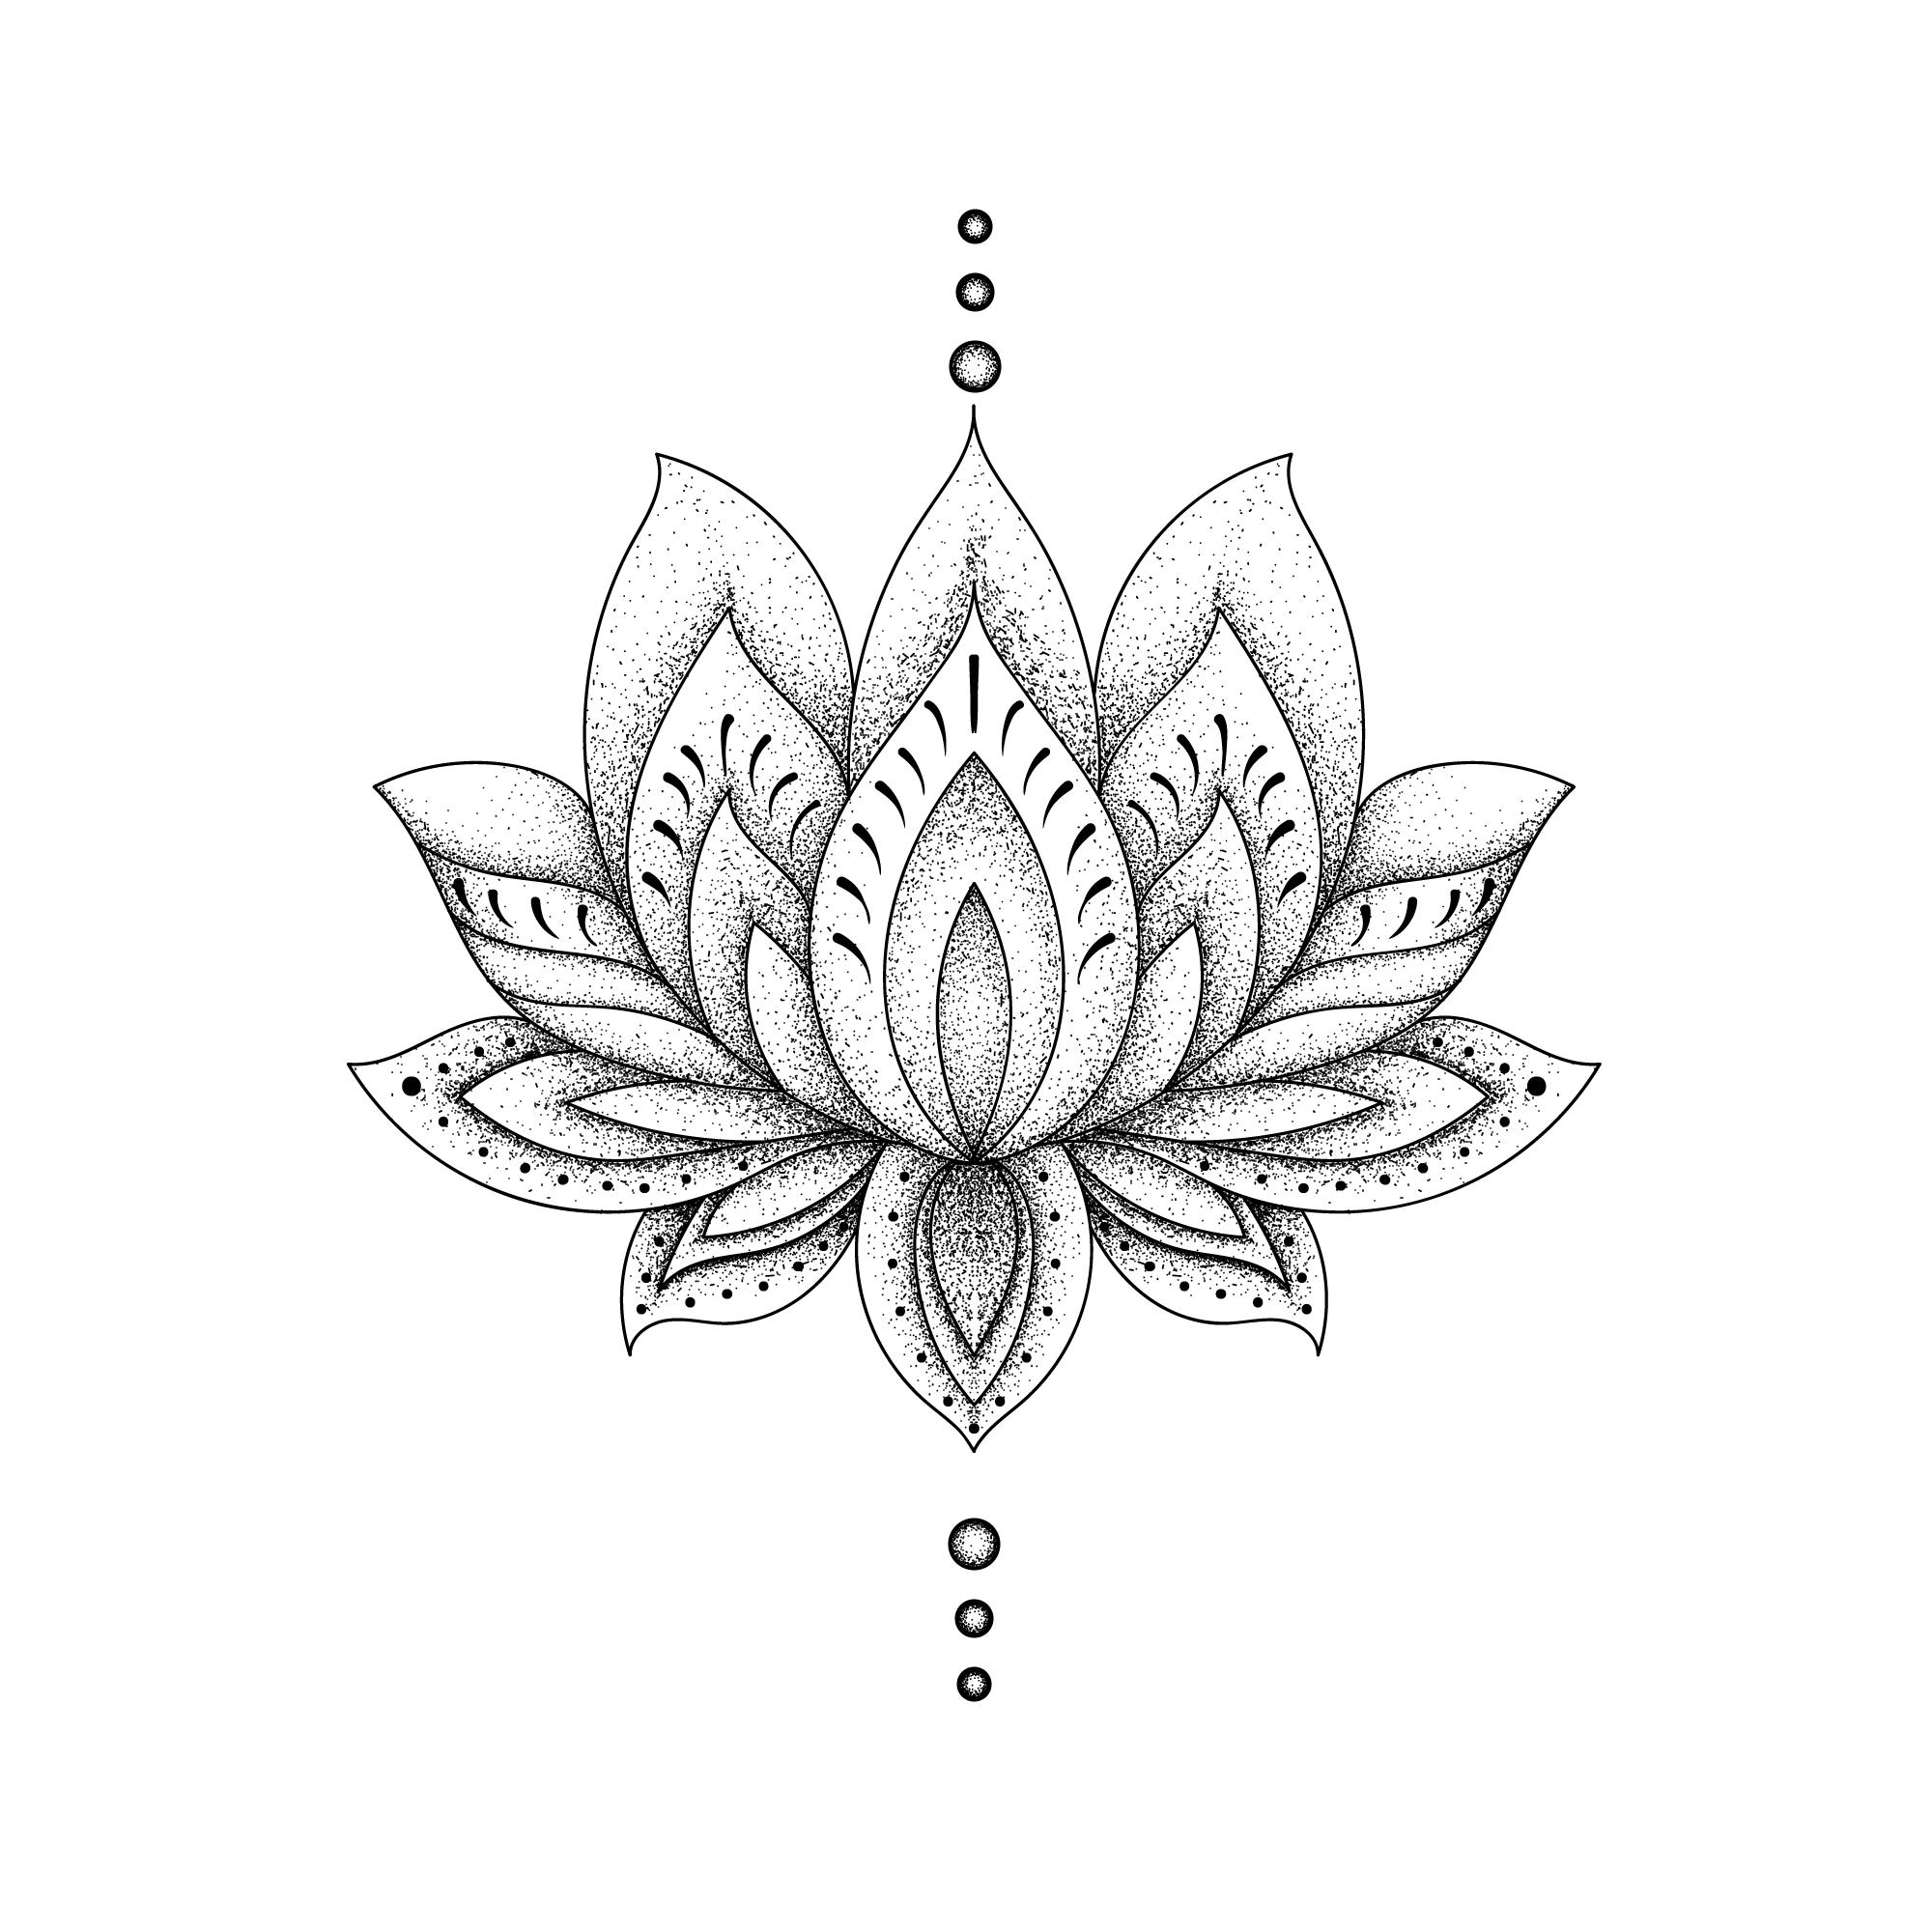 Pin By Camila Stratton On My Art Portfolio Floral Tattoo Sleeve Flower Sketches Flower Tattoo Designs